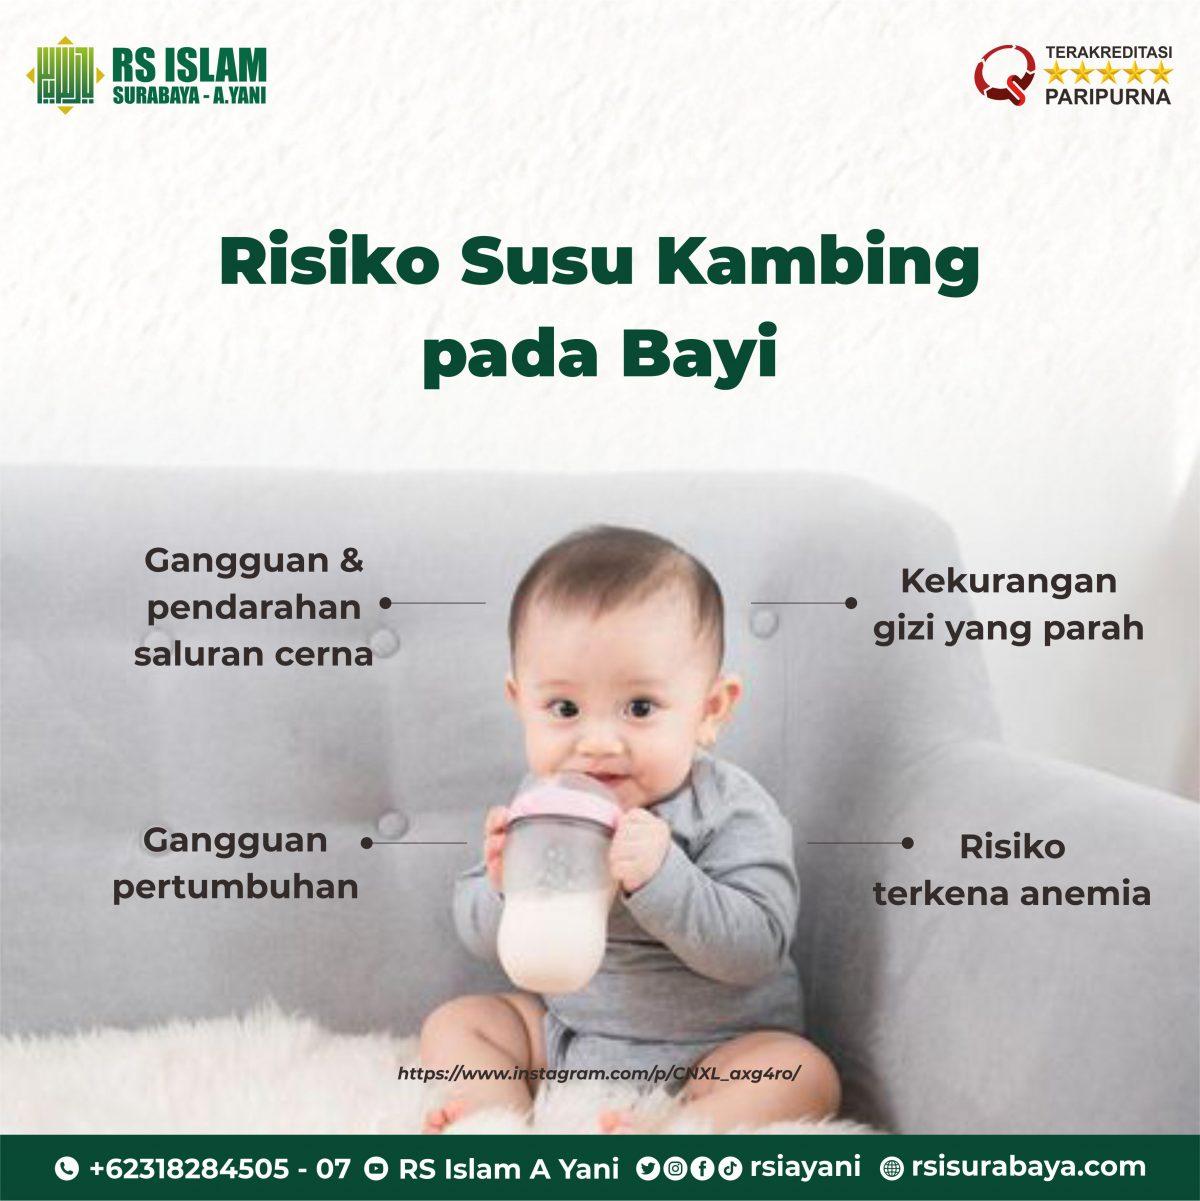 Risiko-Susu-Kambing-1200x1201.jpg